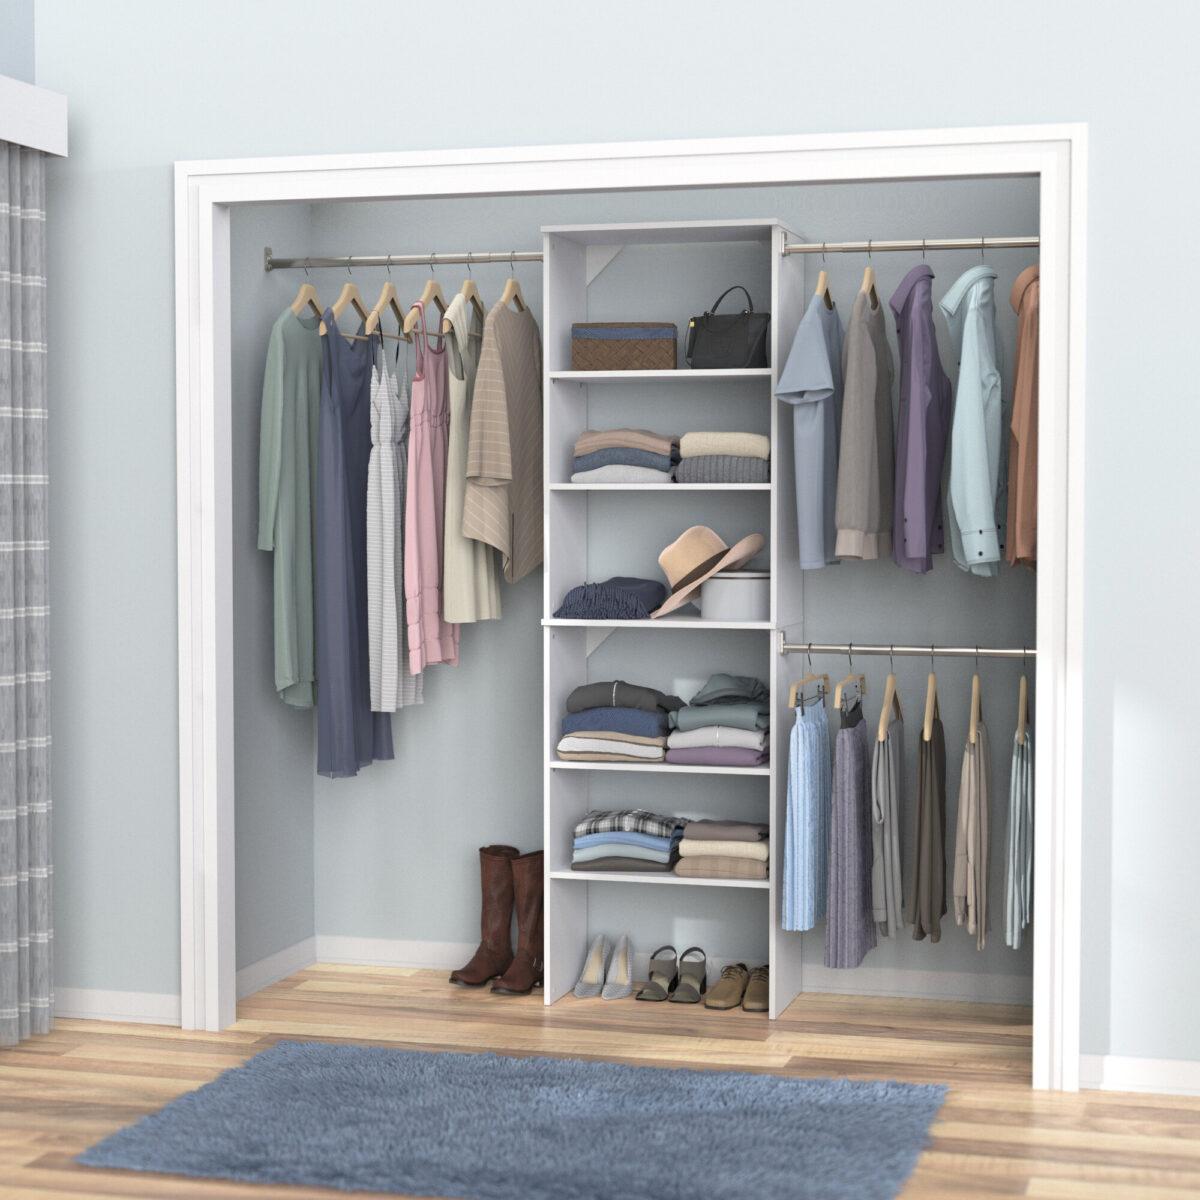 furnish-bedroom-4 × 4-11